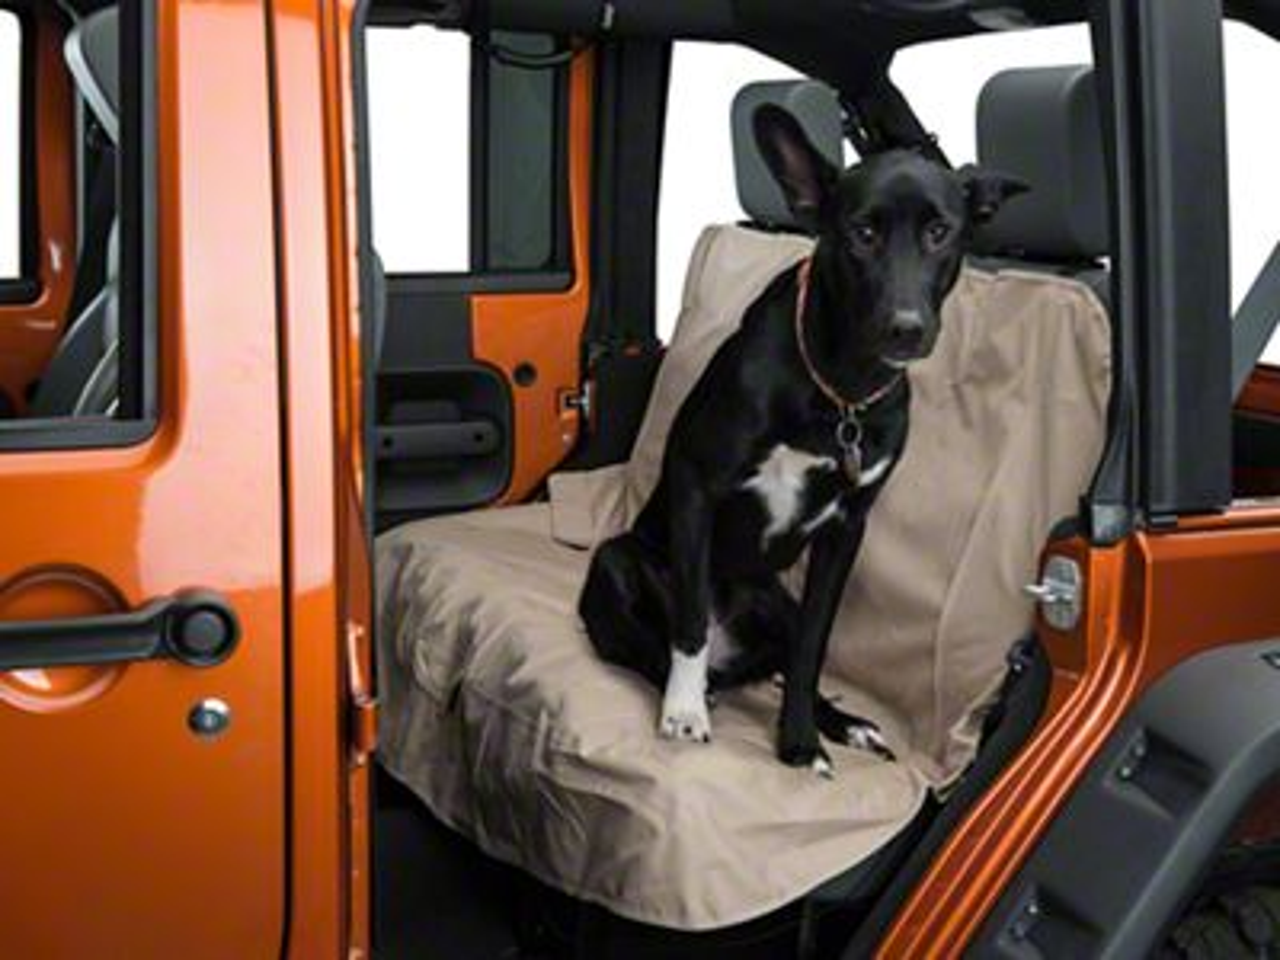 Kurgo Pet Bench Seat Cover - Khaki (87-19 Jeep Wrangler YJ, TJ, JK & JL)